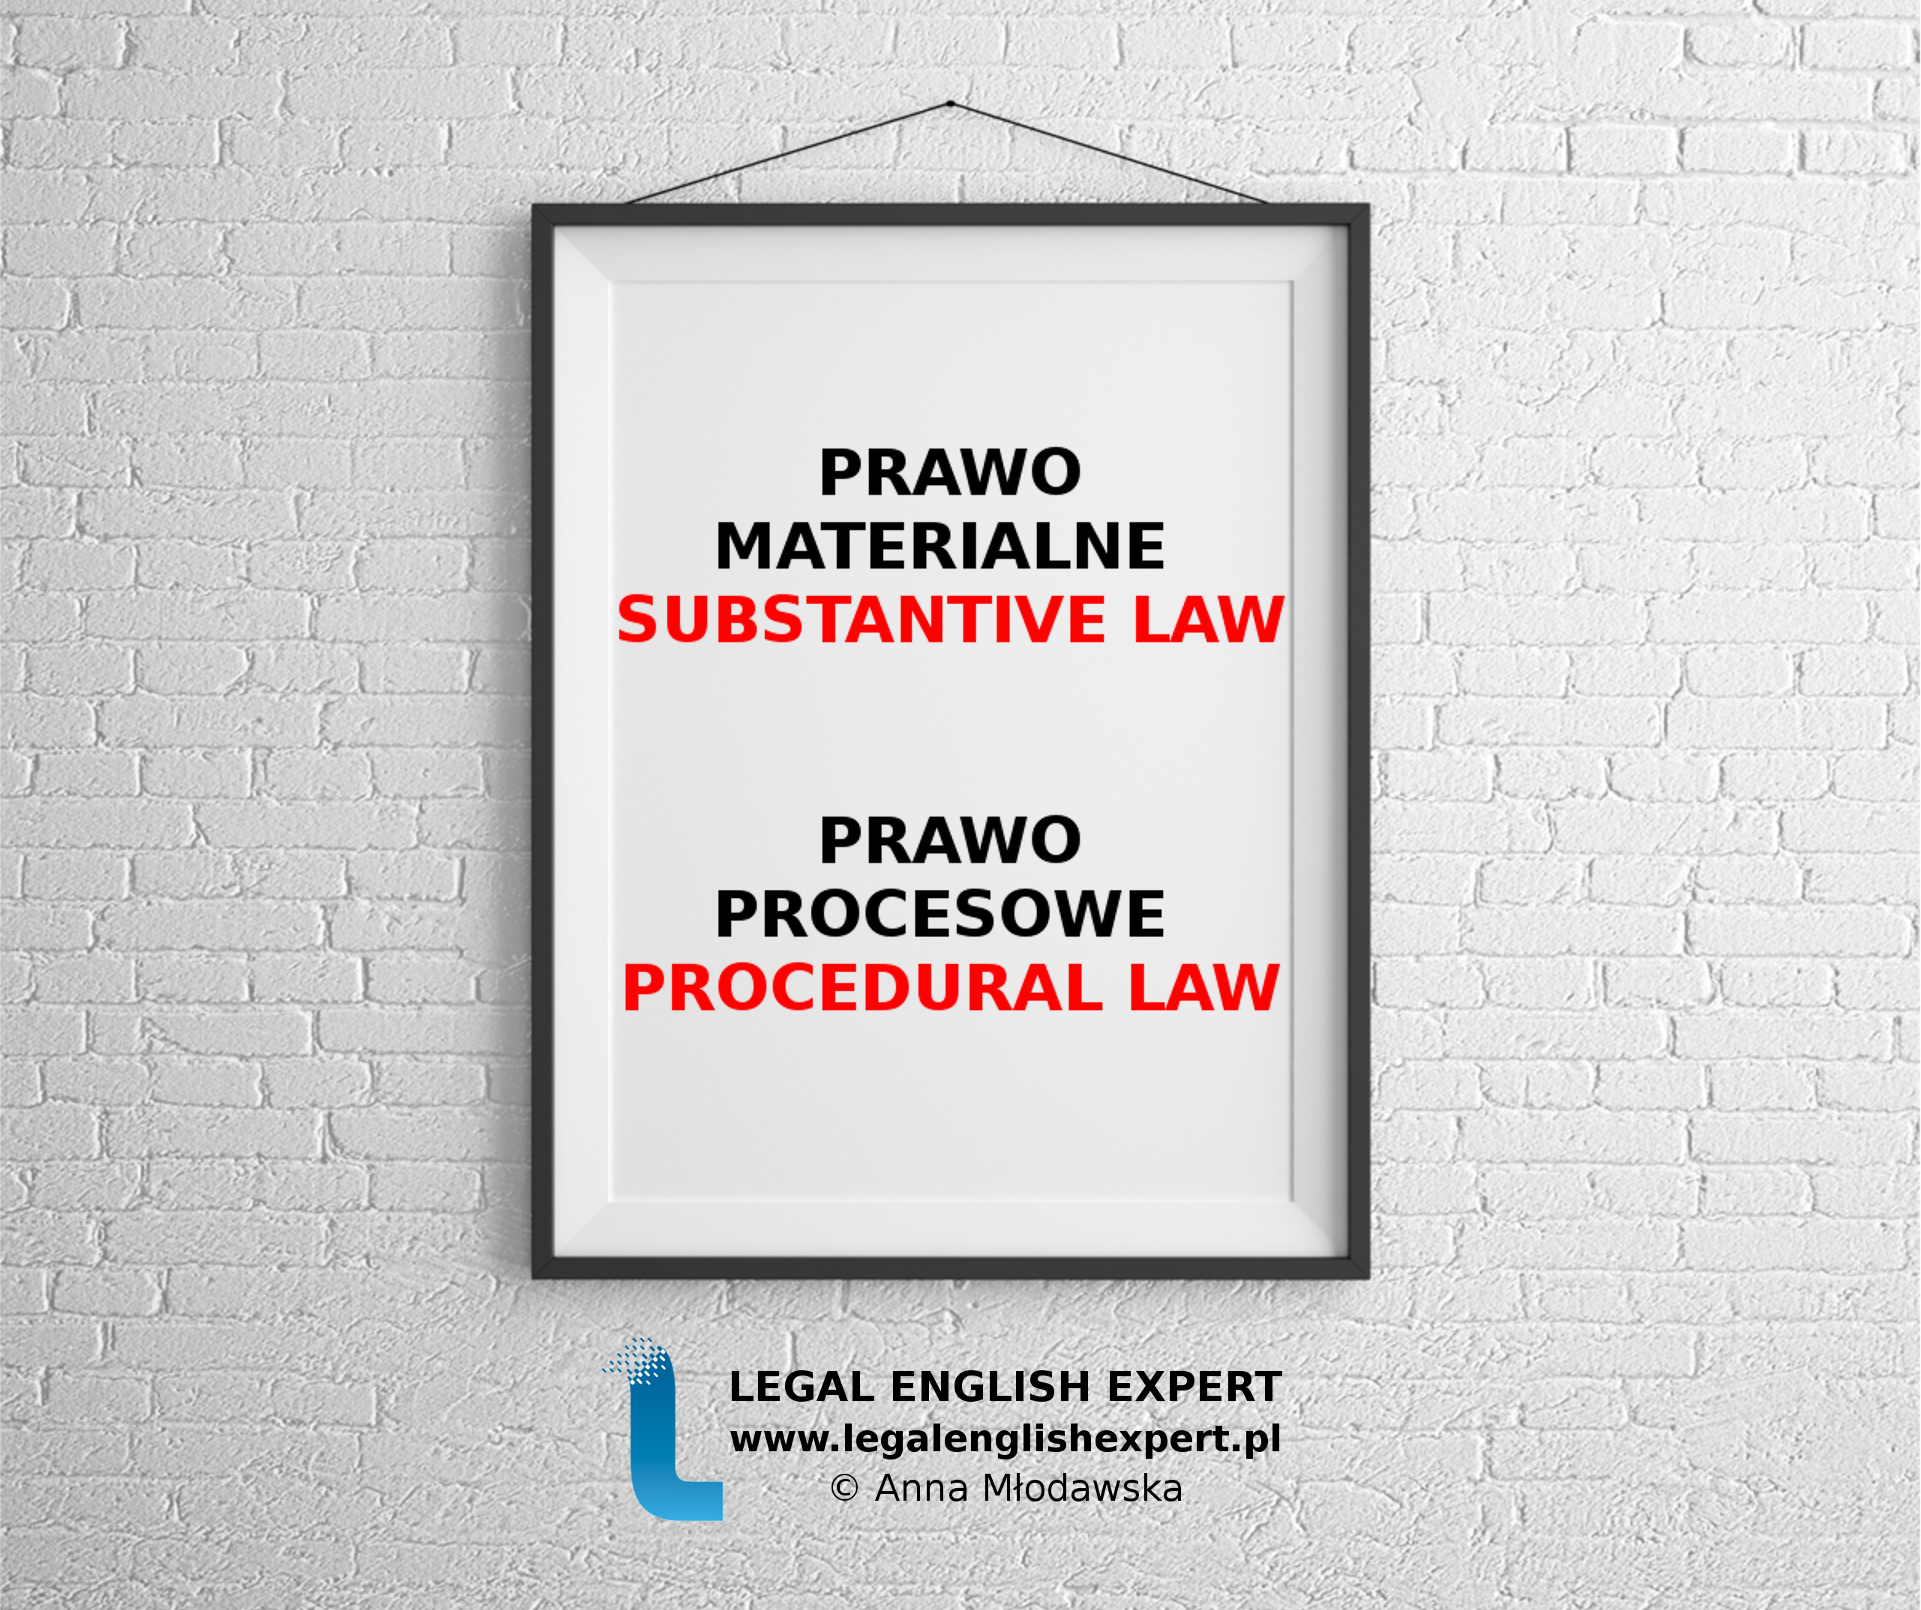 LEGAL ENGLISH EXPERT - infografika_33 - prawo materialne i procesowe